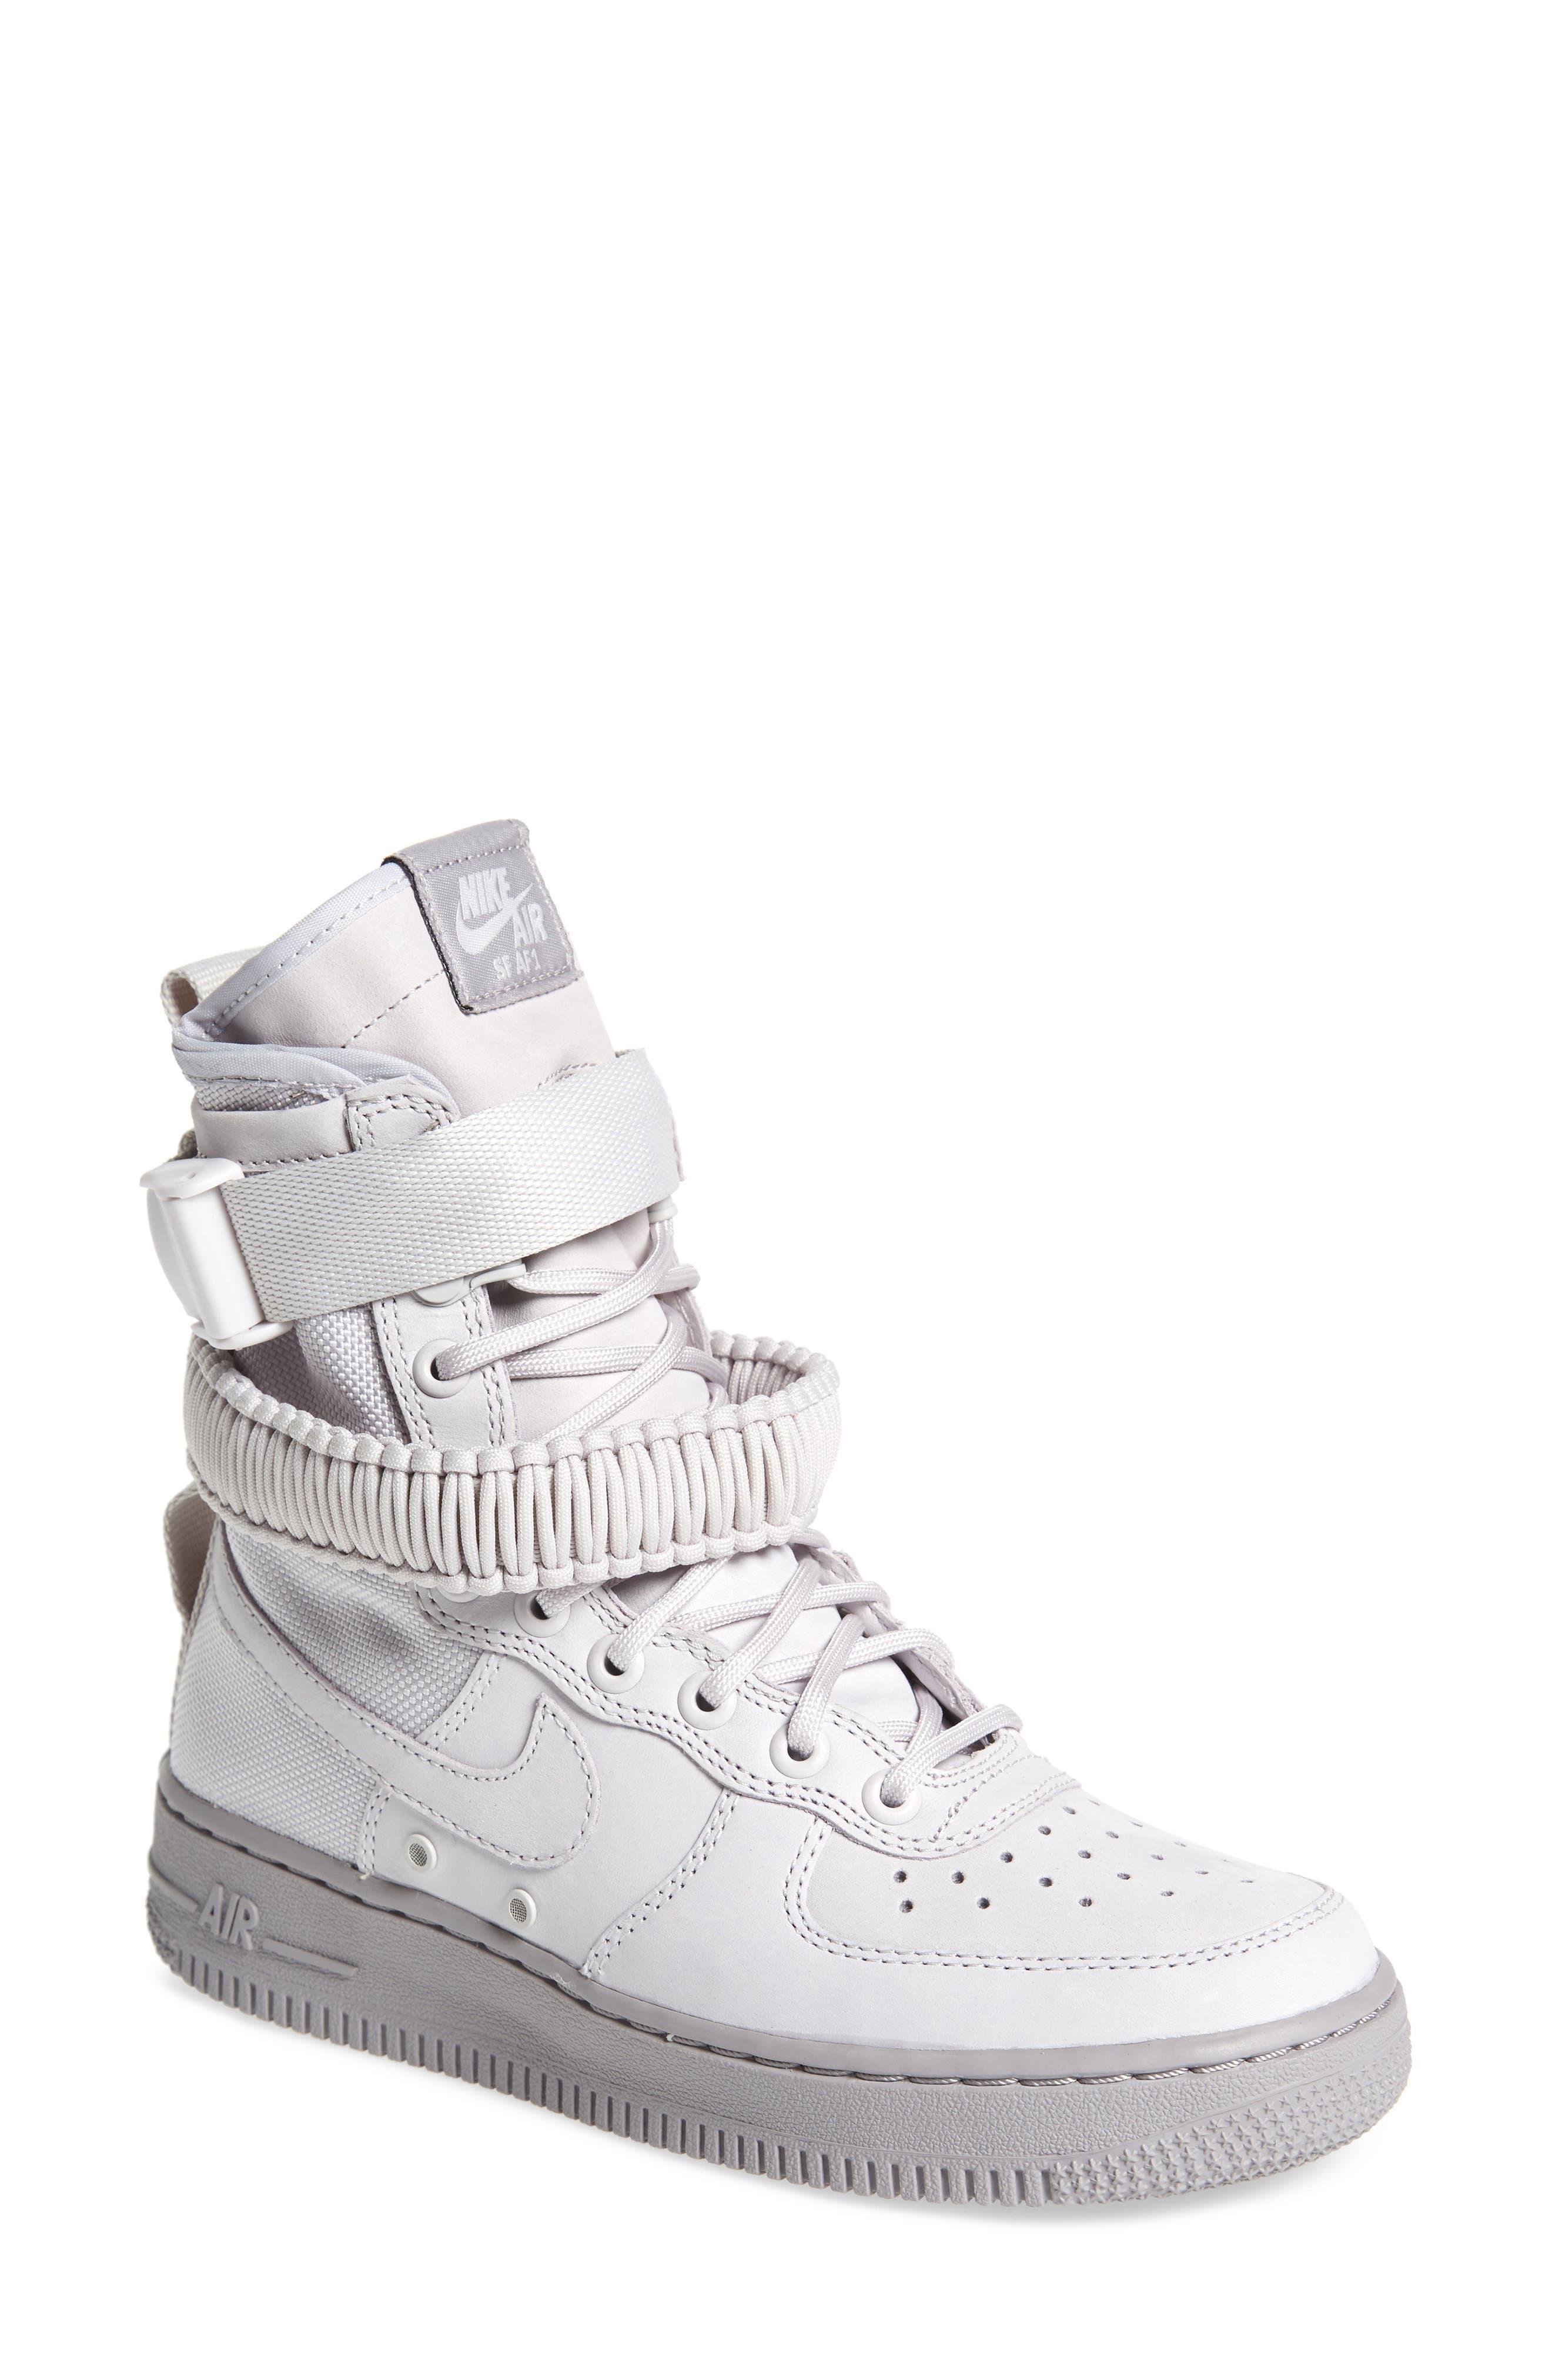 SF Air Force 1 High Top Sneaker,                         Main,                         color, Vast Grey/ Vast Grey